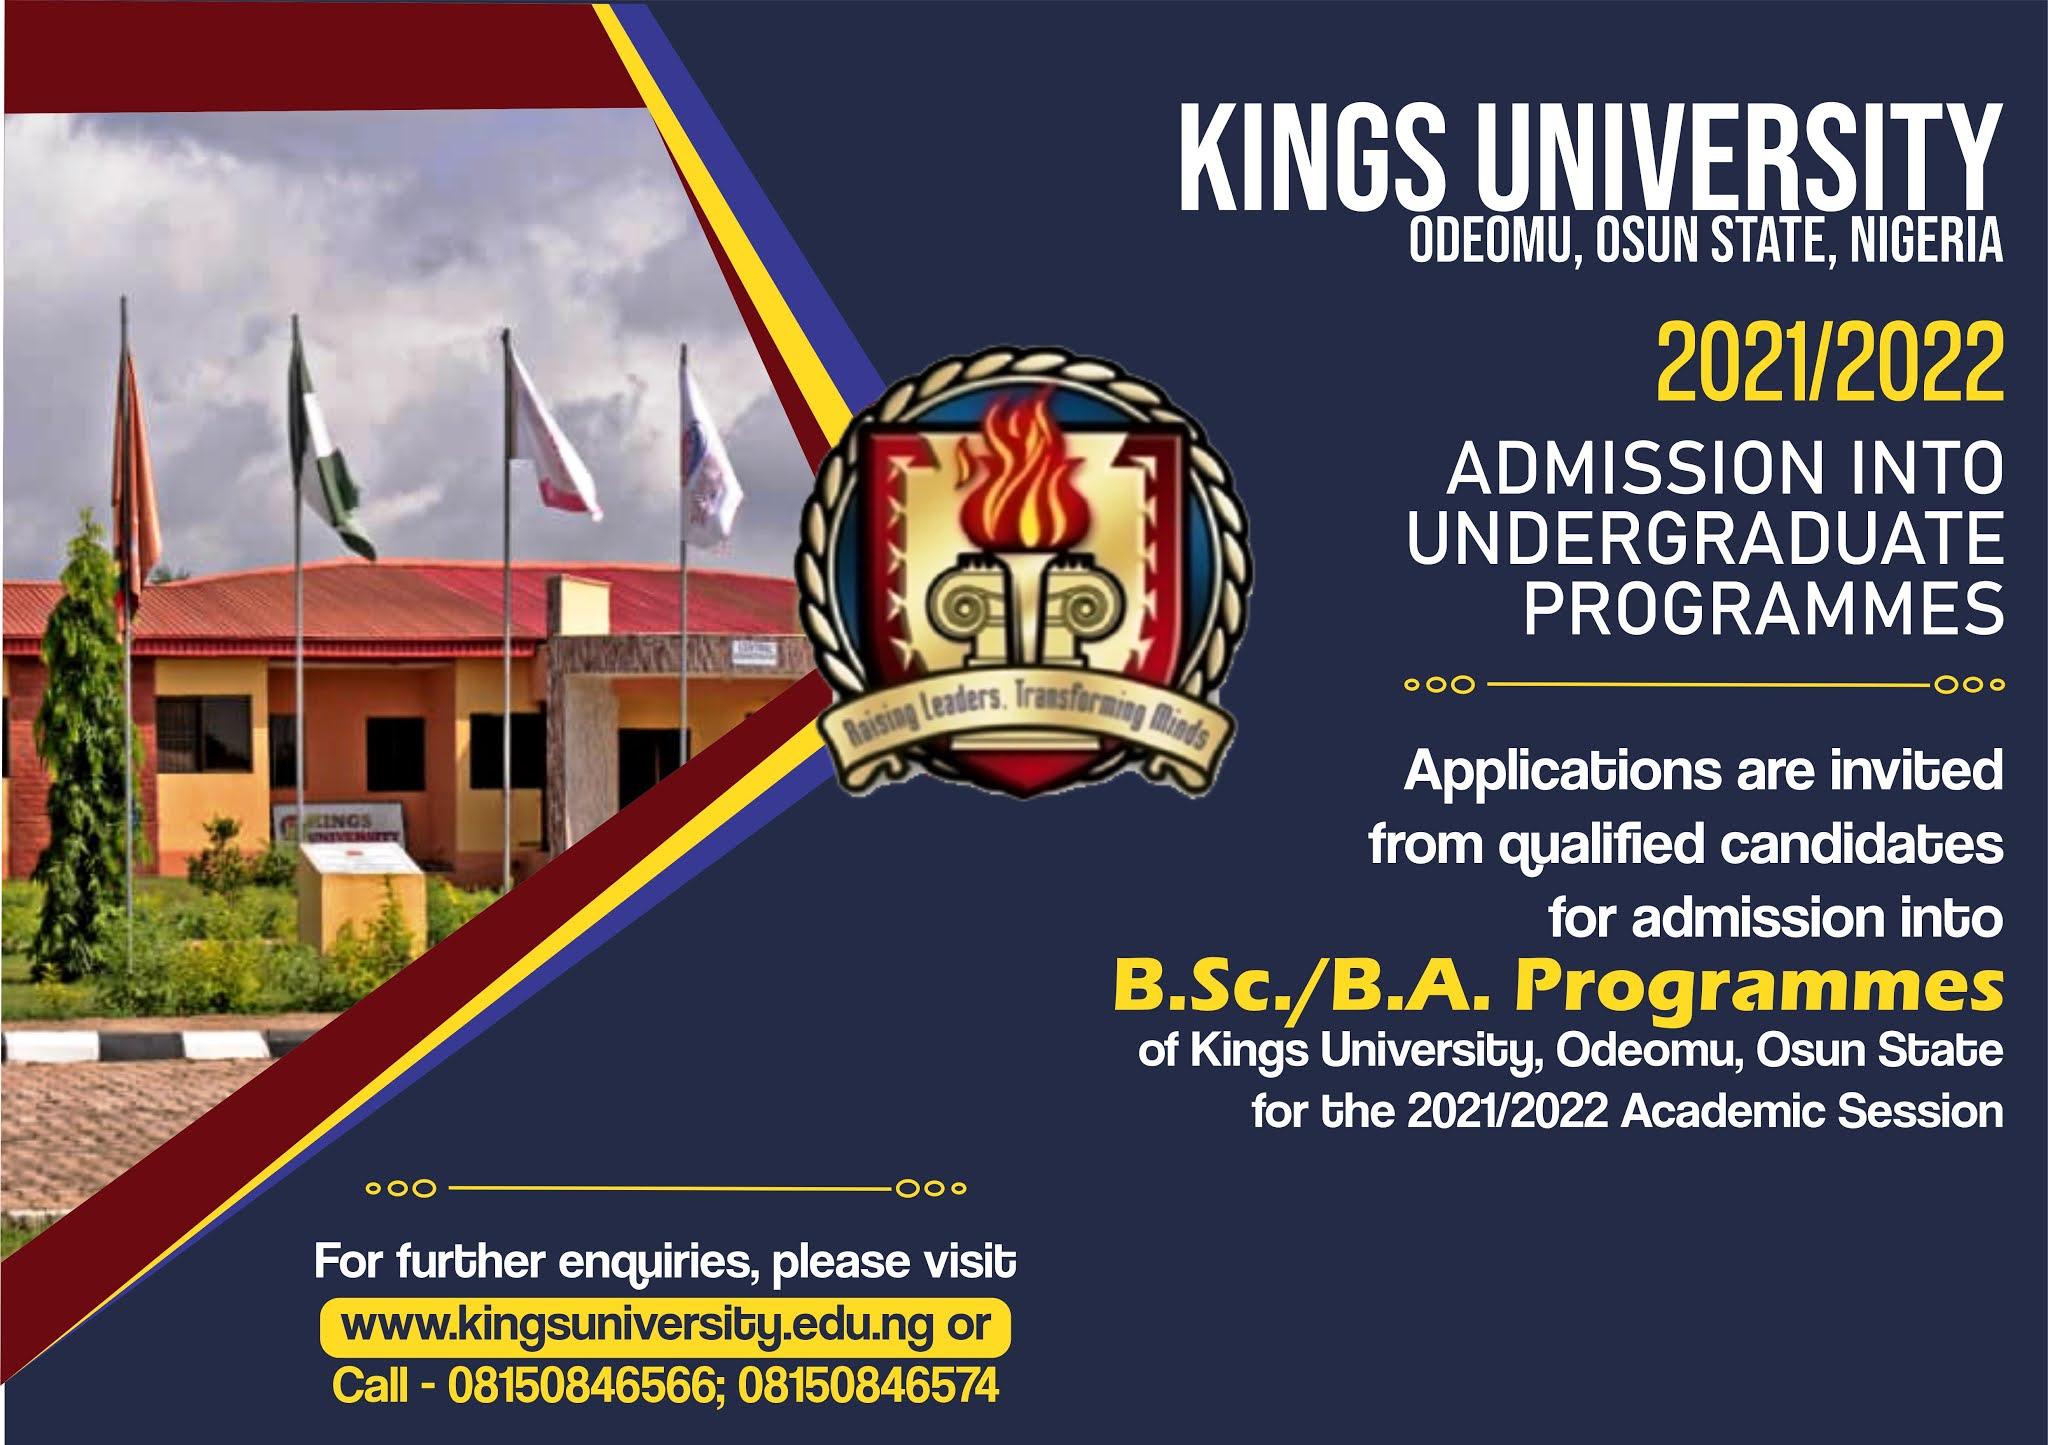 Kings University Post-UTME & DE Screening Form 2021/2022